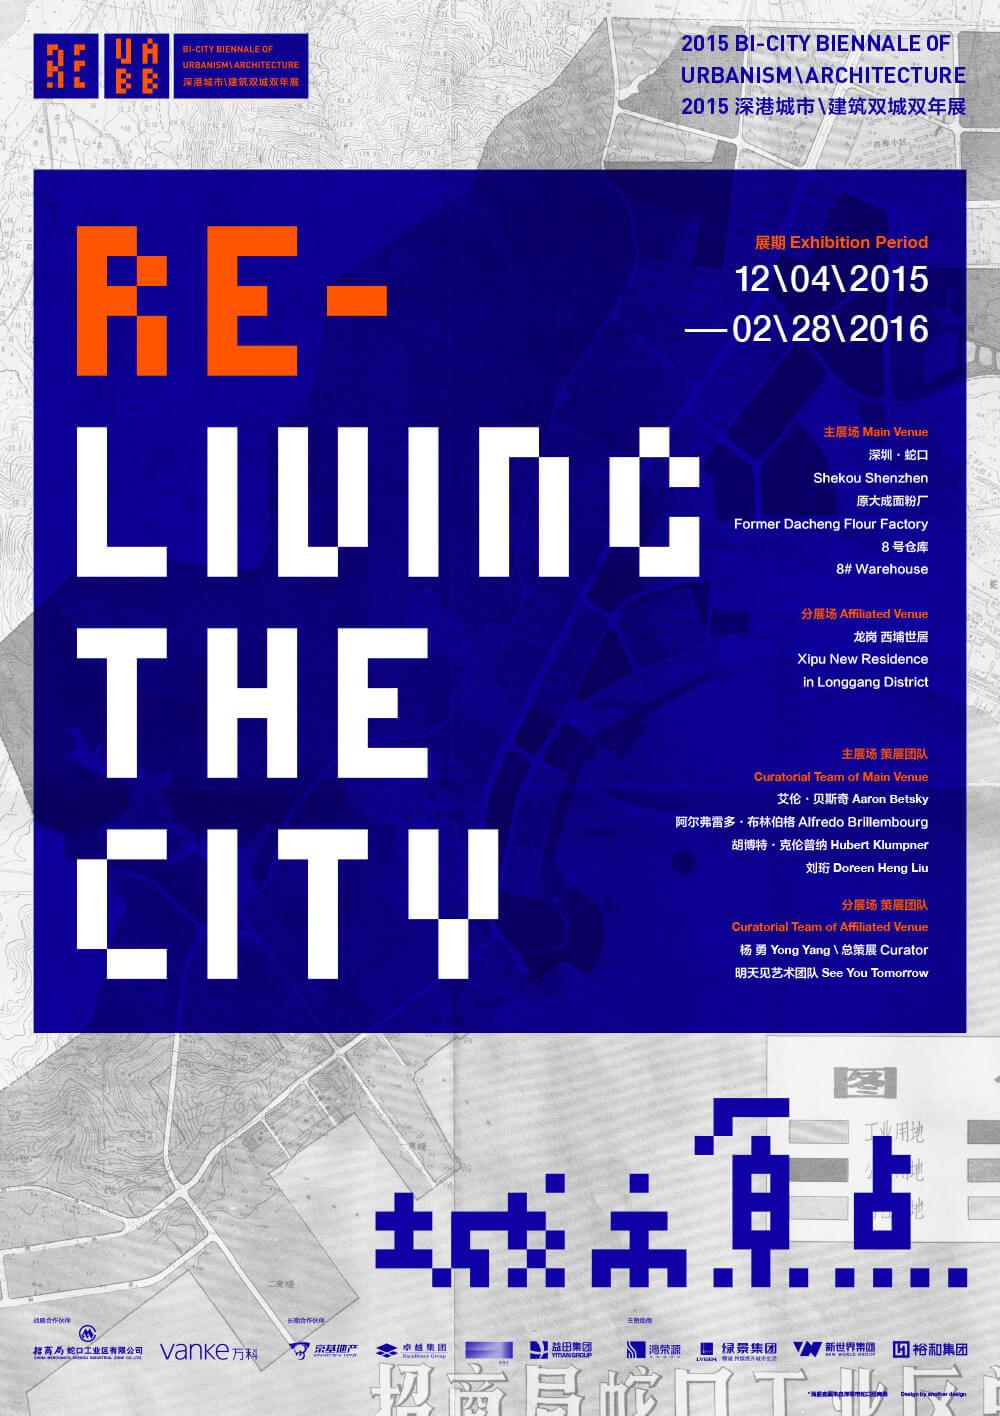 6th Bi-City Biennale of Urbanism / Architecture (UABB)